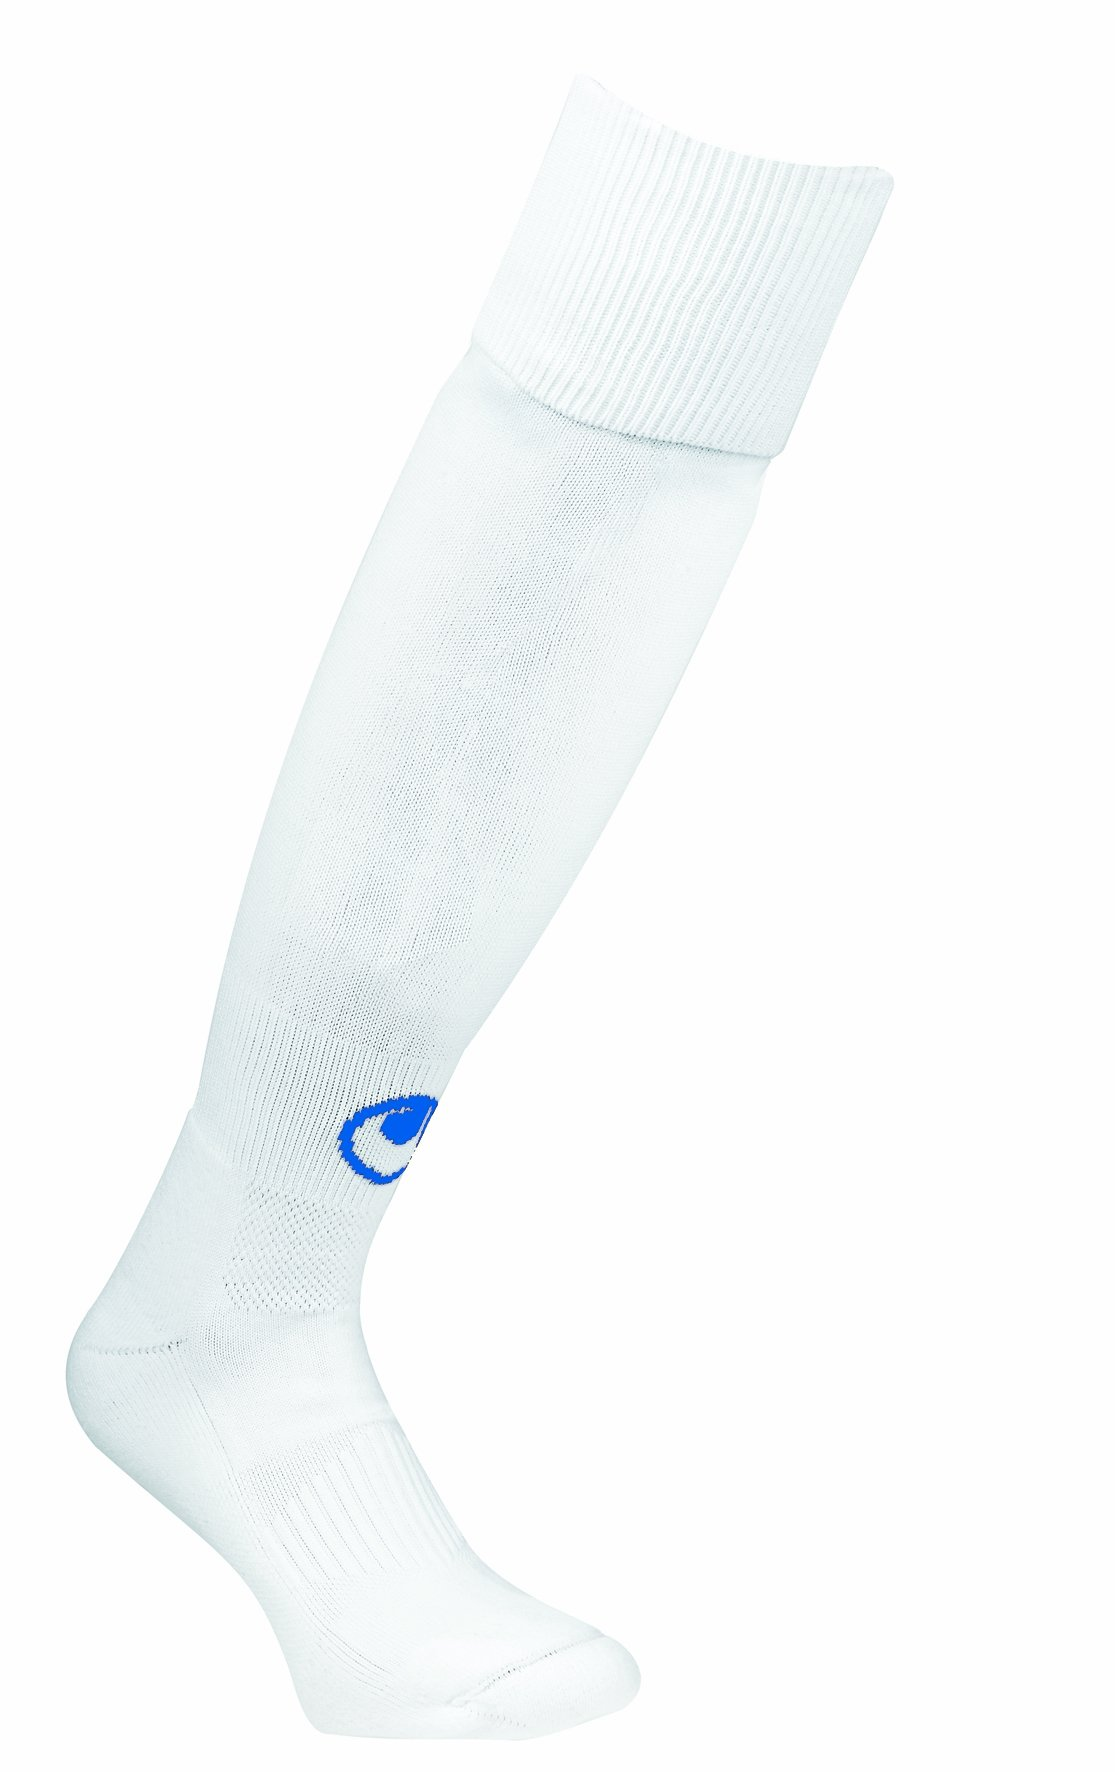 uhlsport - Team Pro Classic, Calze per bambini, Bianco/Blu, 33-36